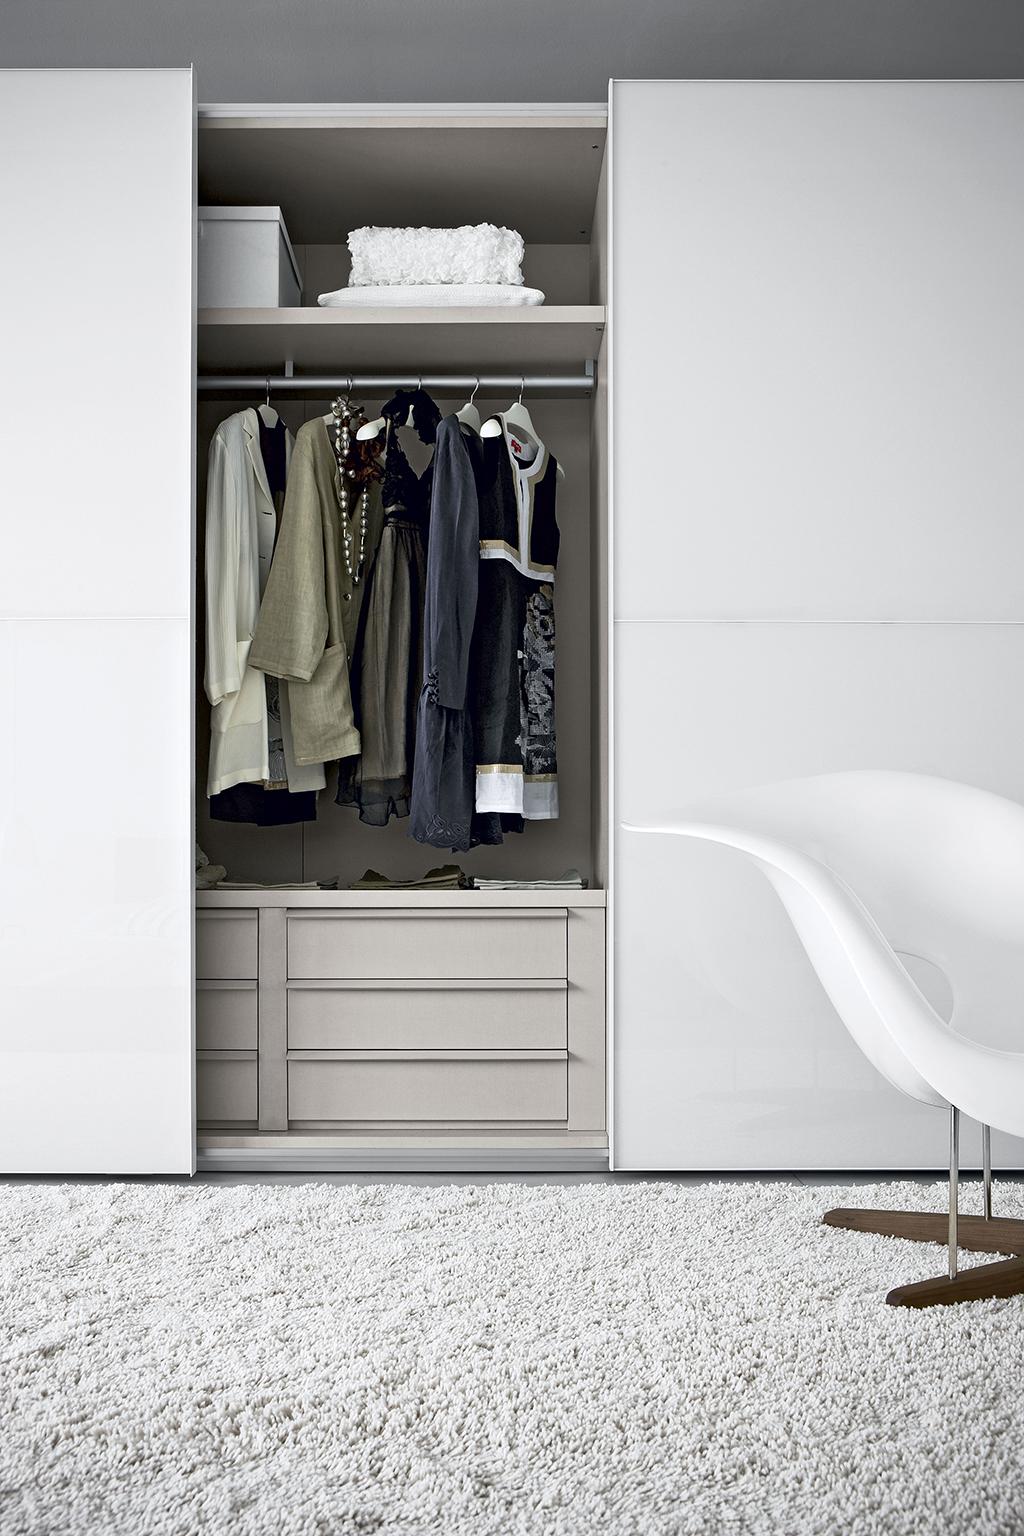 amore 055 fitted bedroom furniture wardrobes uk lawrence walsh furniture. Black Bedroom Furniture Sets. Home Design Ideas